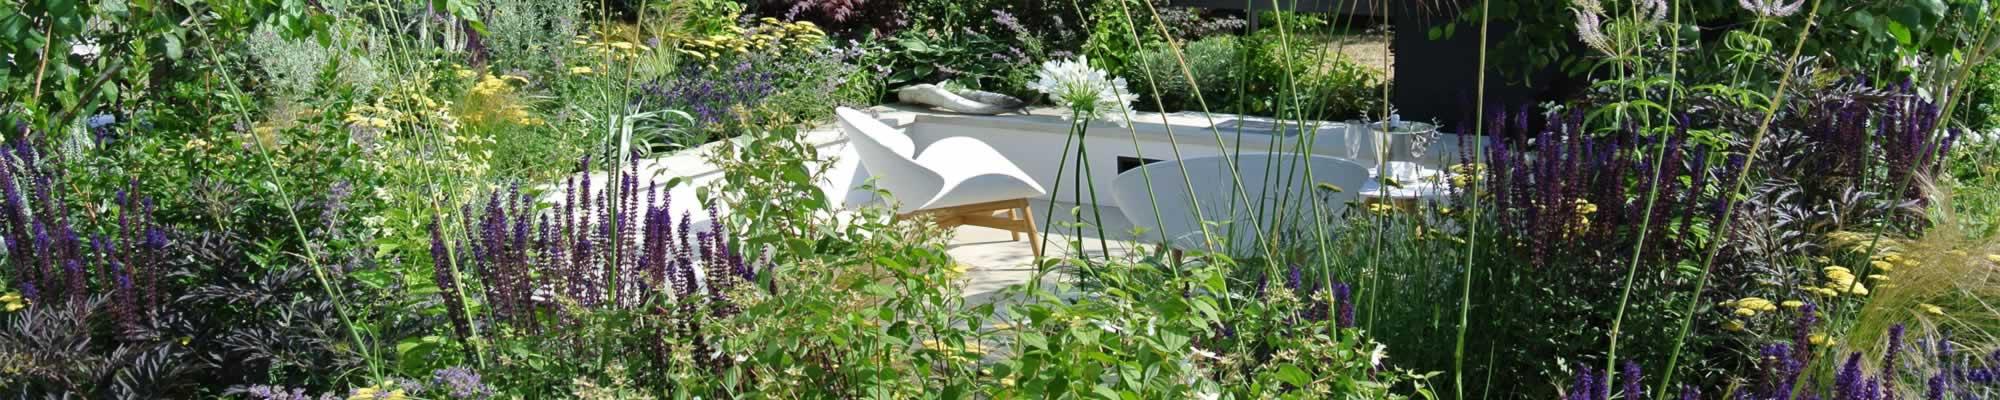 Garden Designers Wimbledon SW19 London Surrey UK